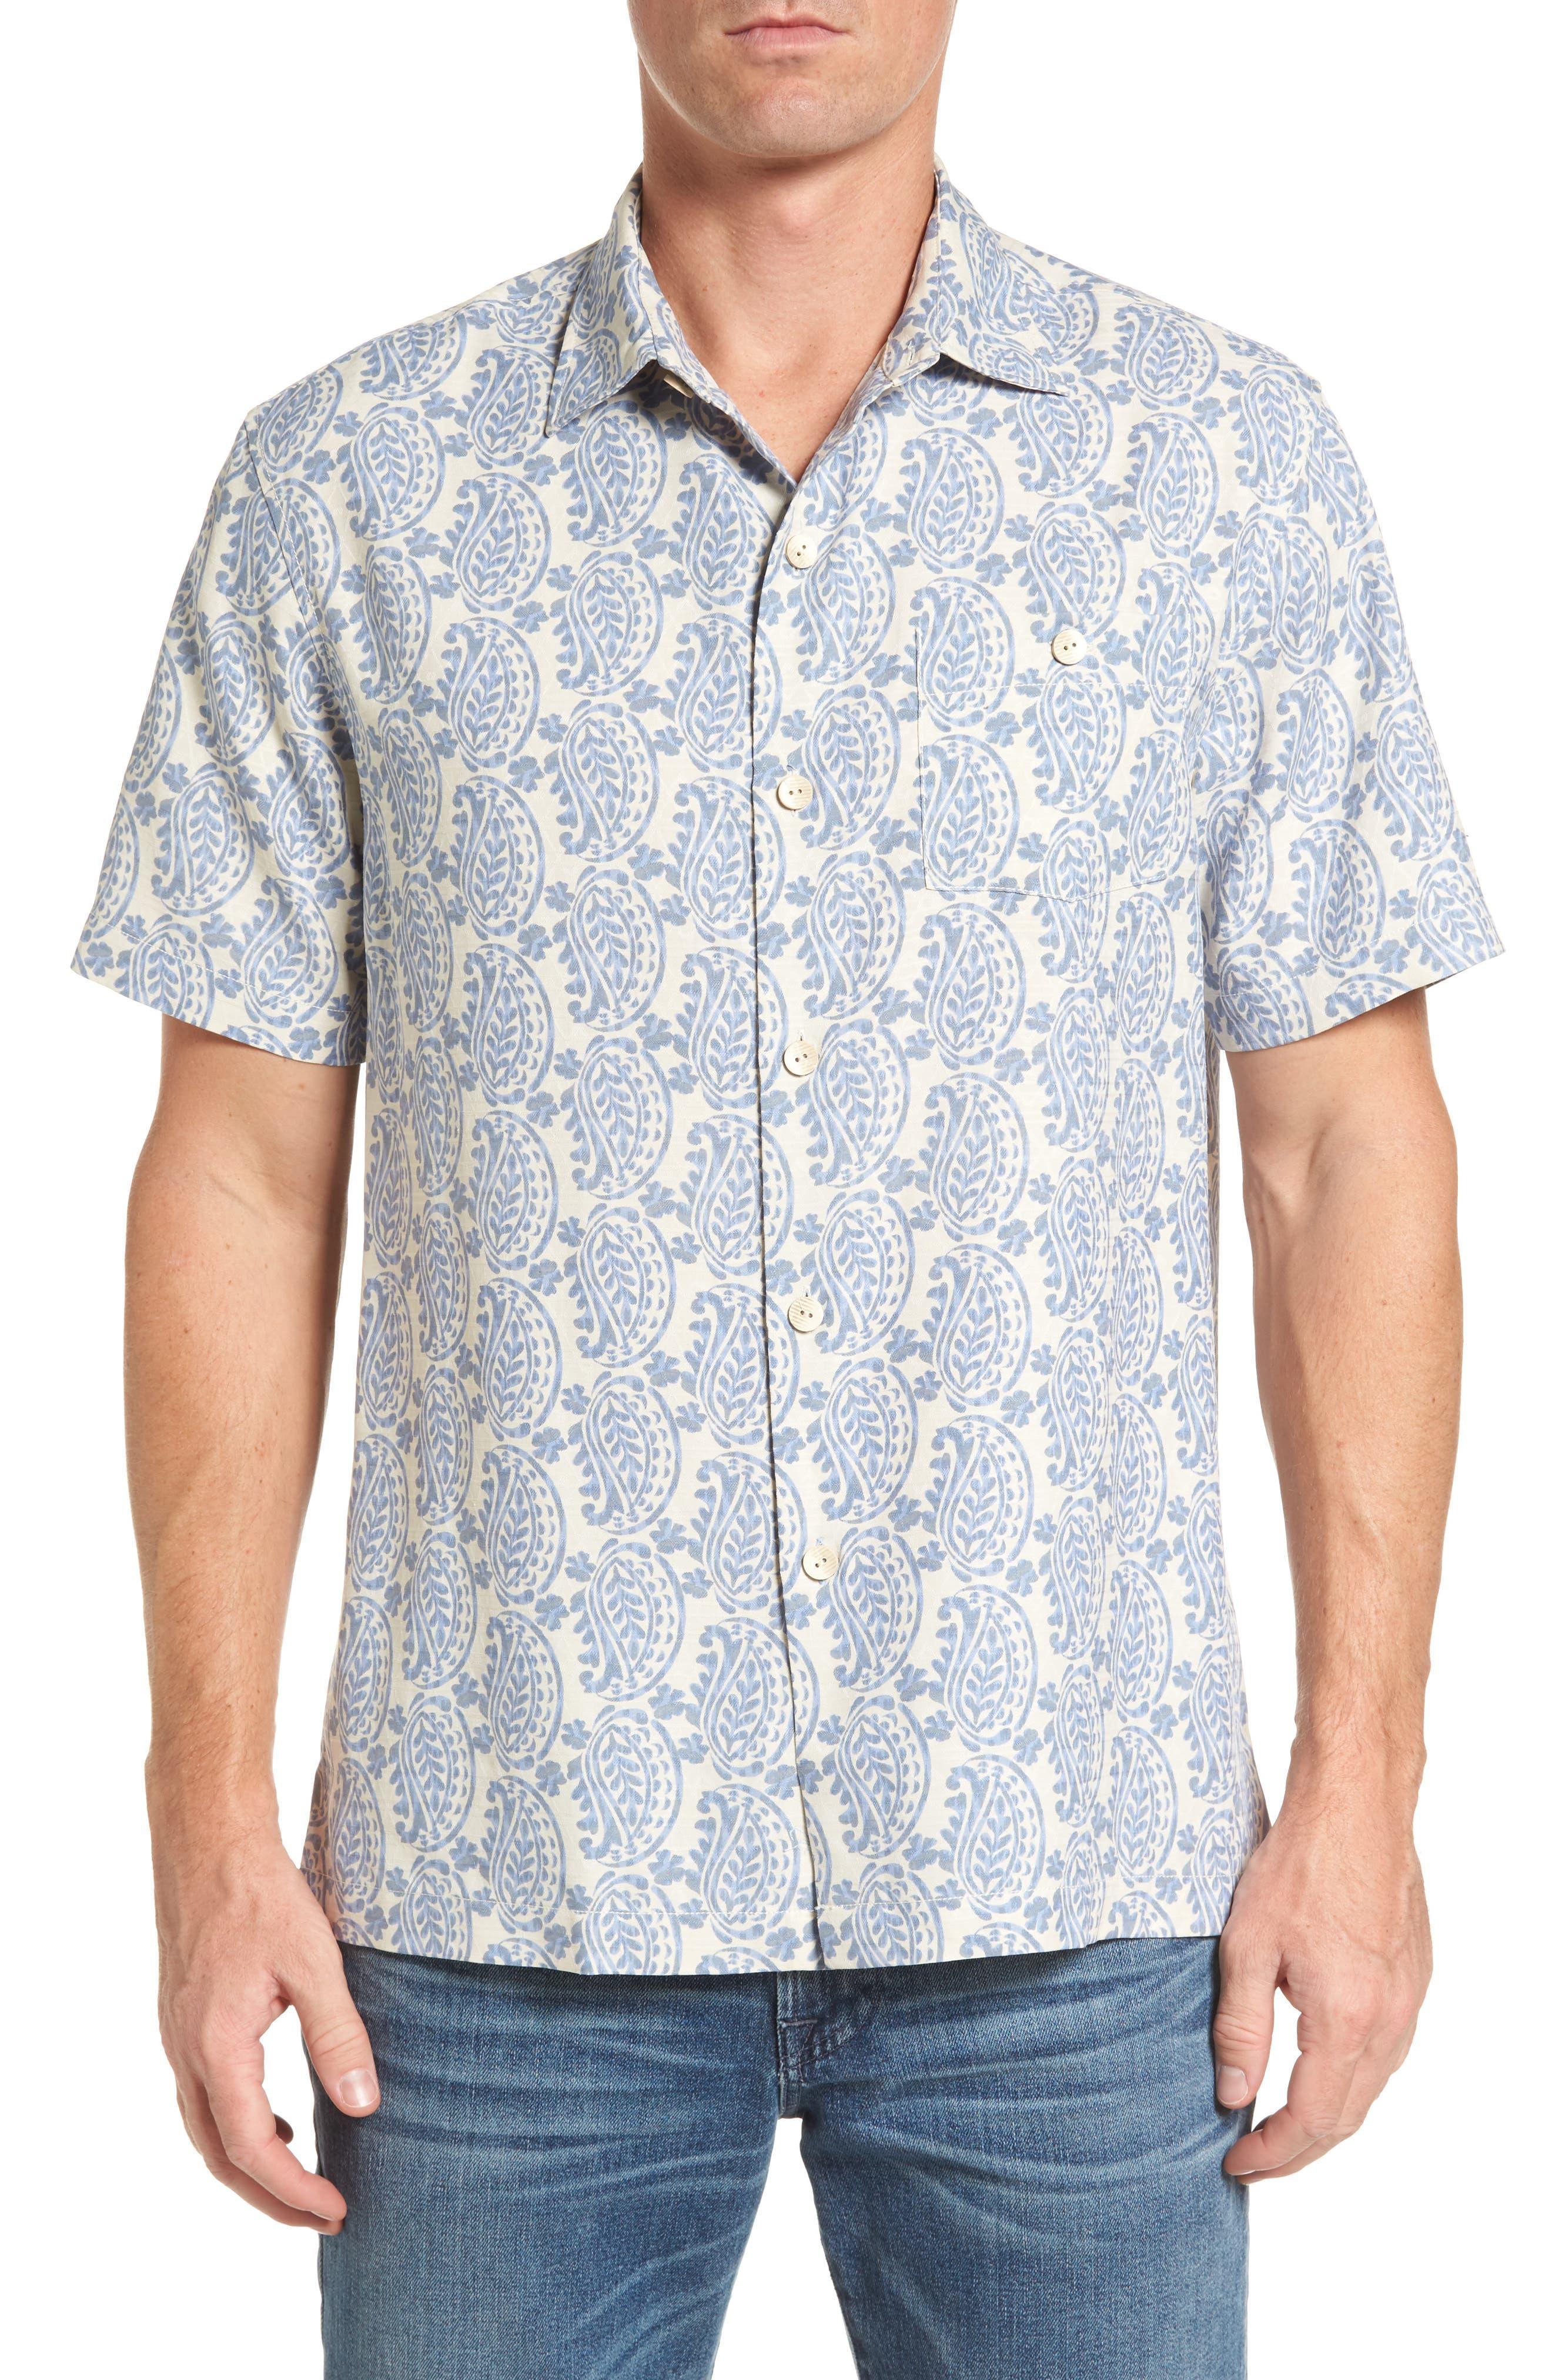 Main Image - Tommy Bahama Paisley Days Woven Shirt